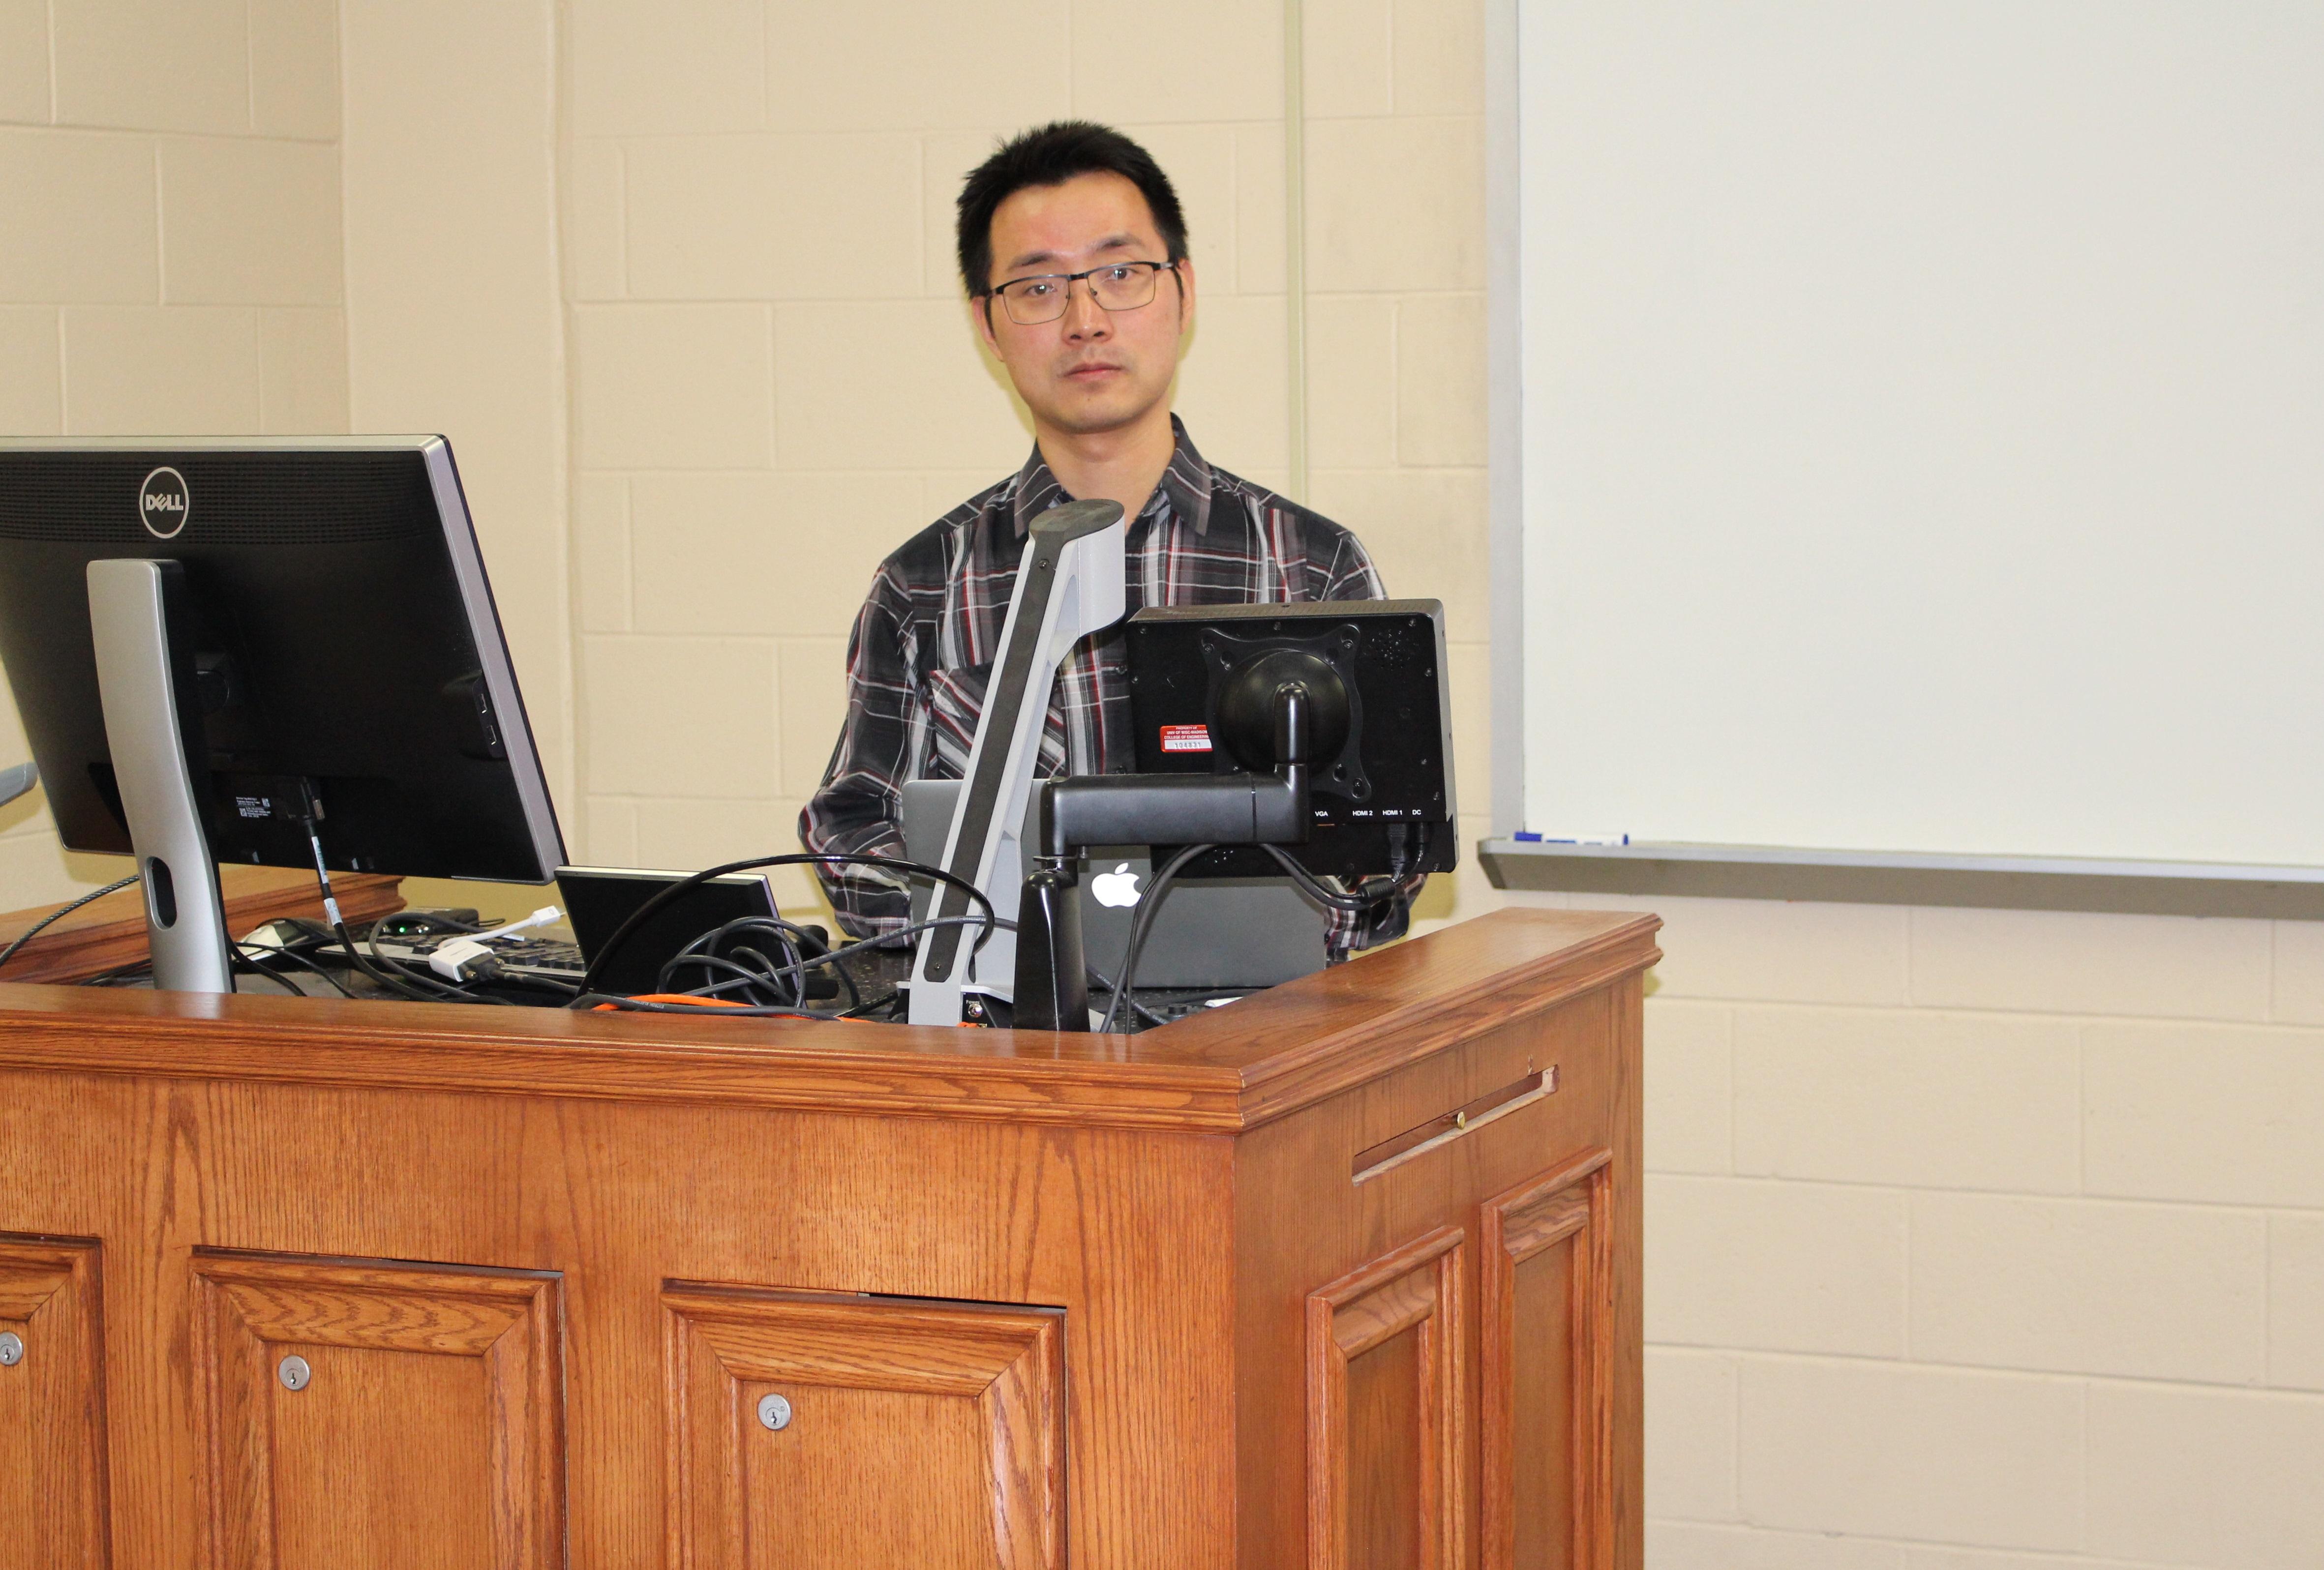 Professor Kevin Jin